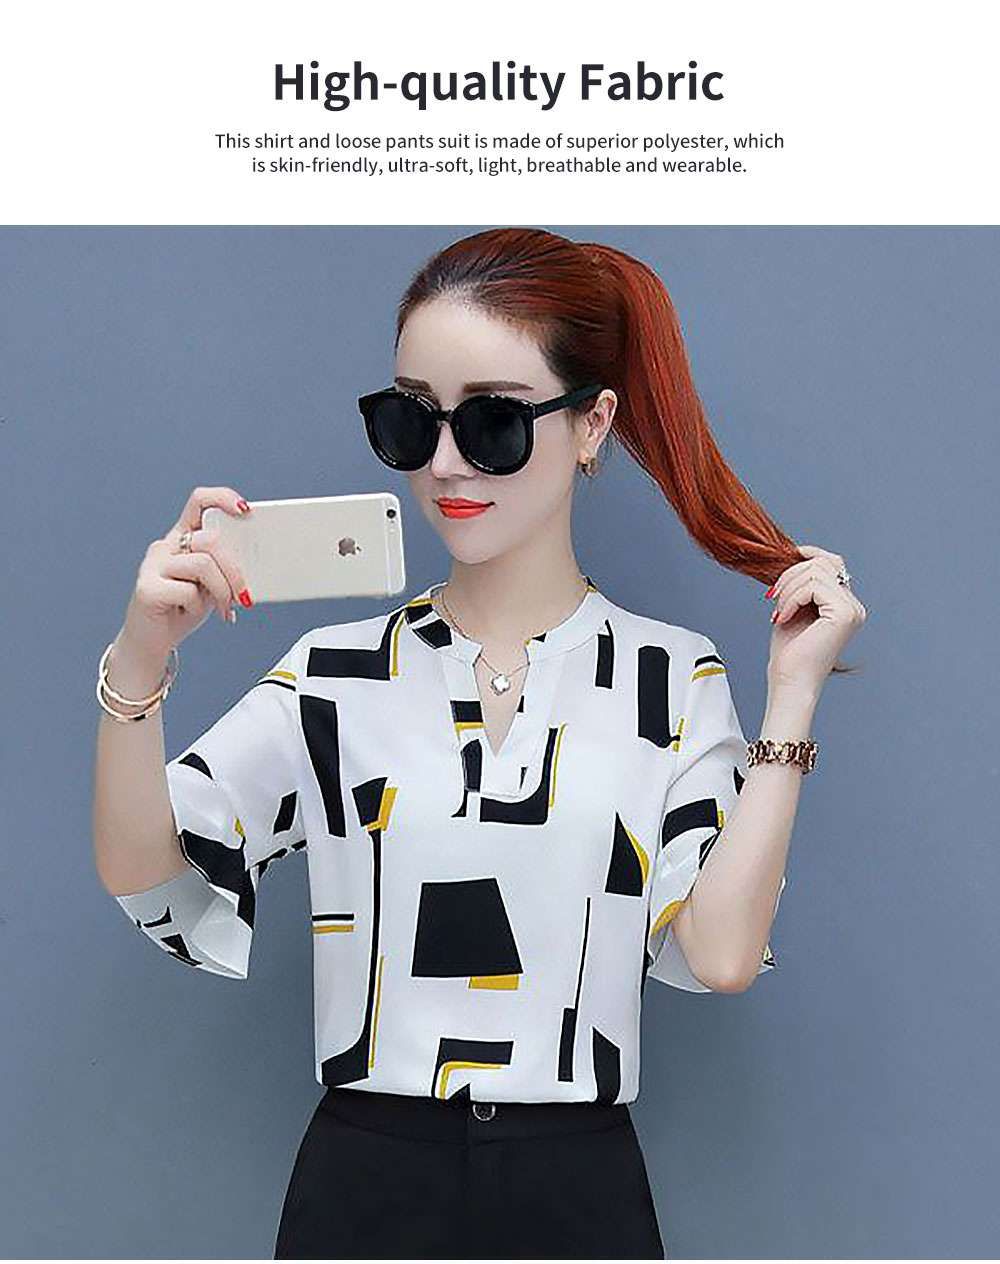 Stylish V-Neck Line Chiffon Shirt Loose Pants Suit for Ladies Minimalist Geometric Figure Pattern Decorative Tops with Falbala Sleeves 1